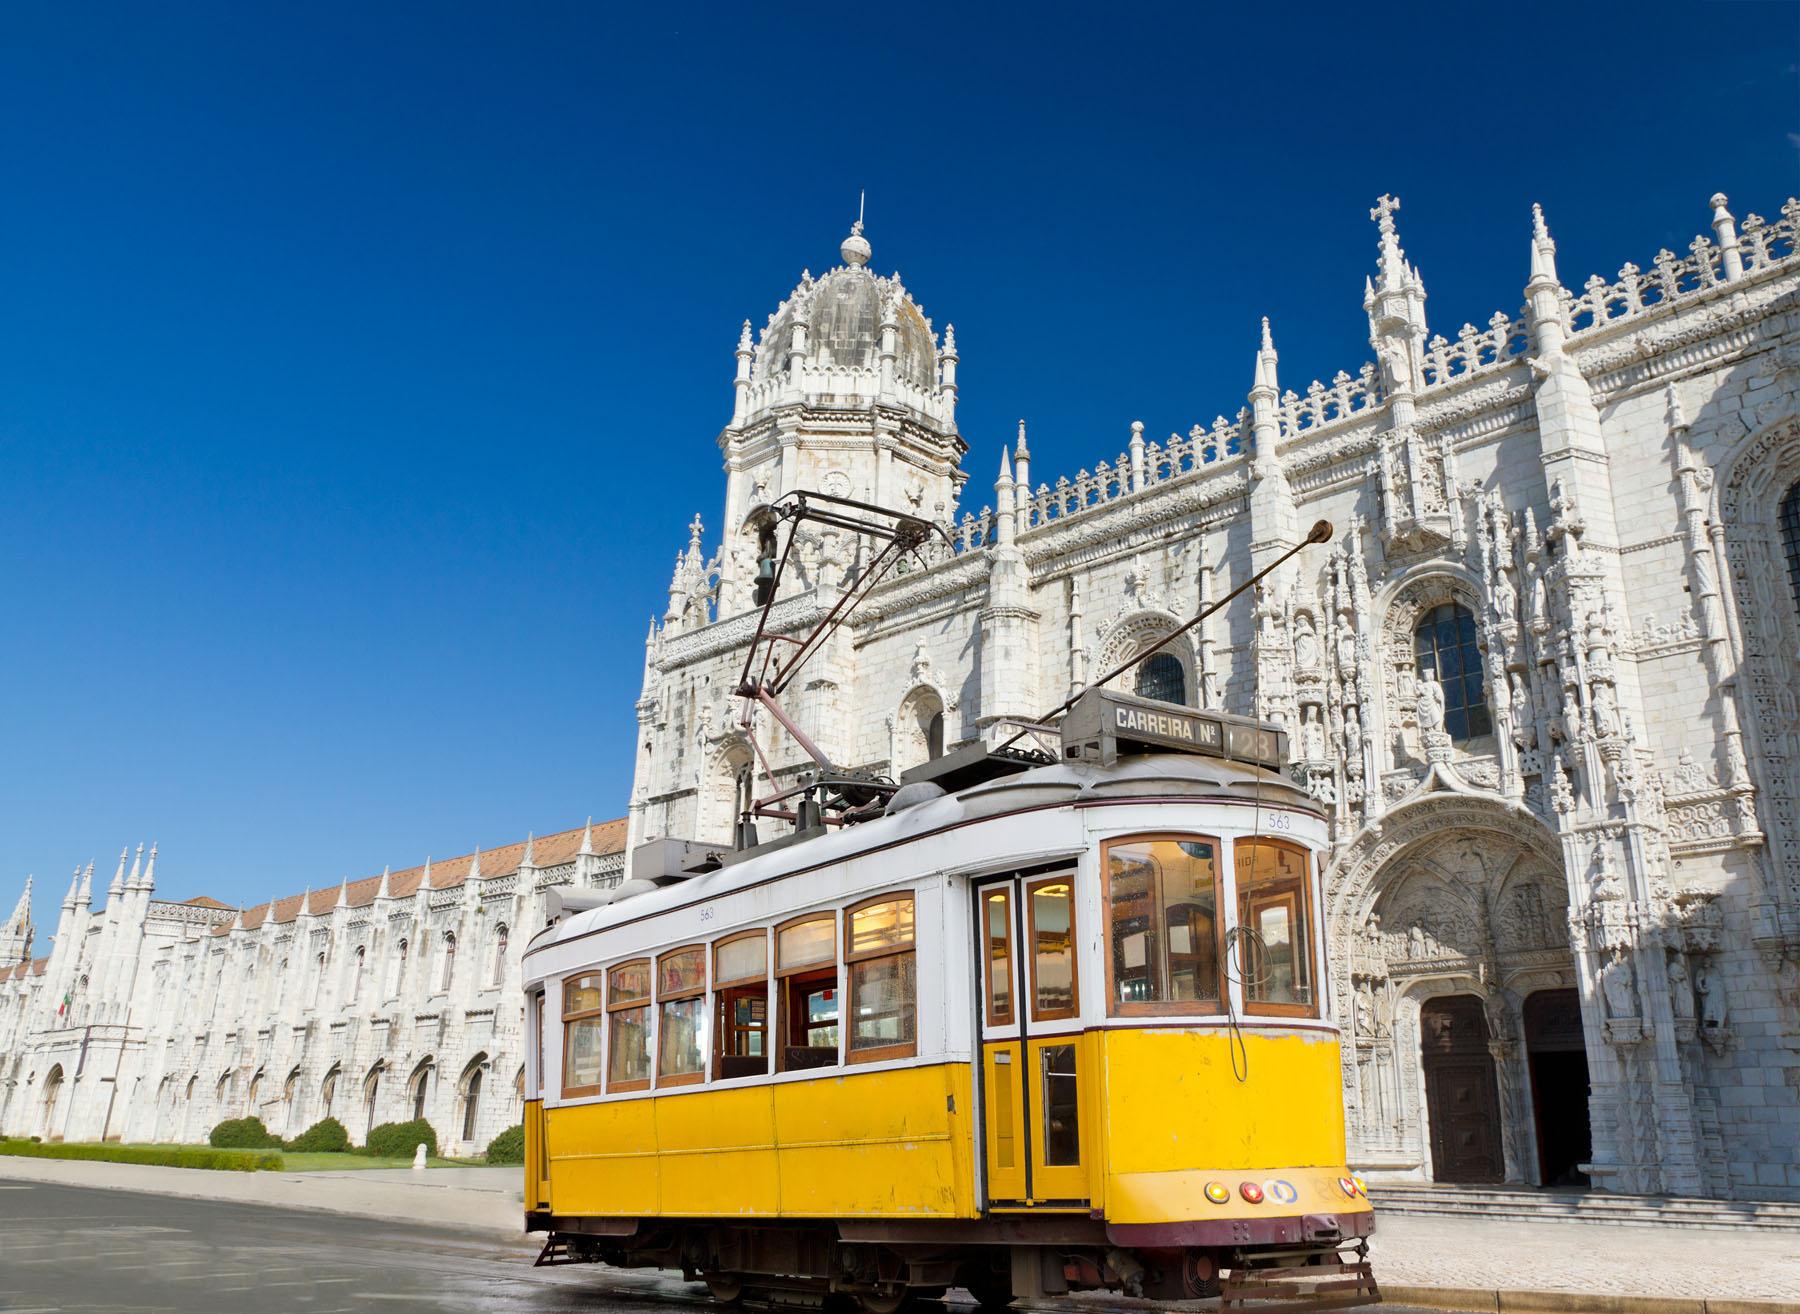 Portugal-Lisbon_92182423